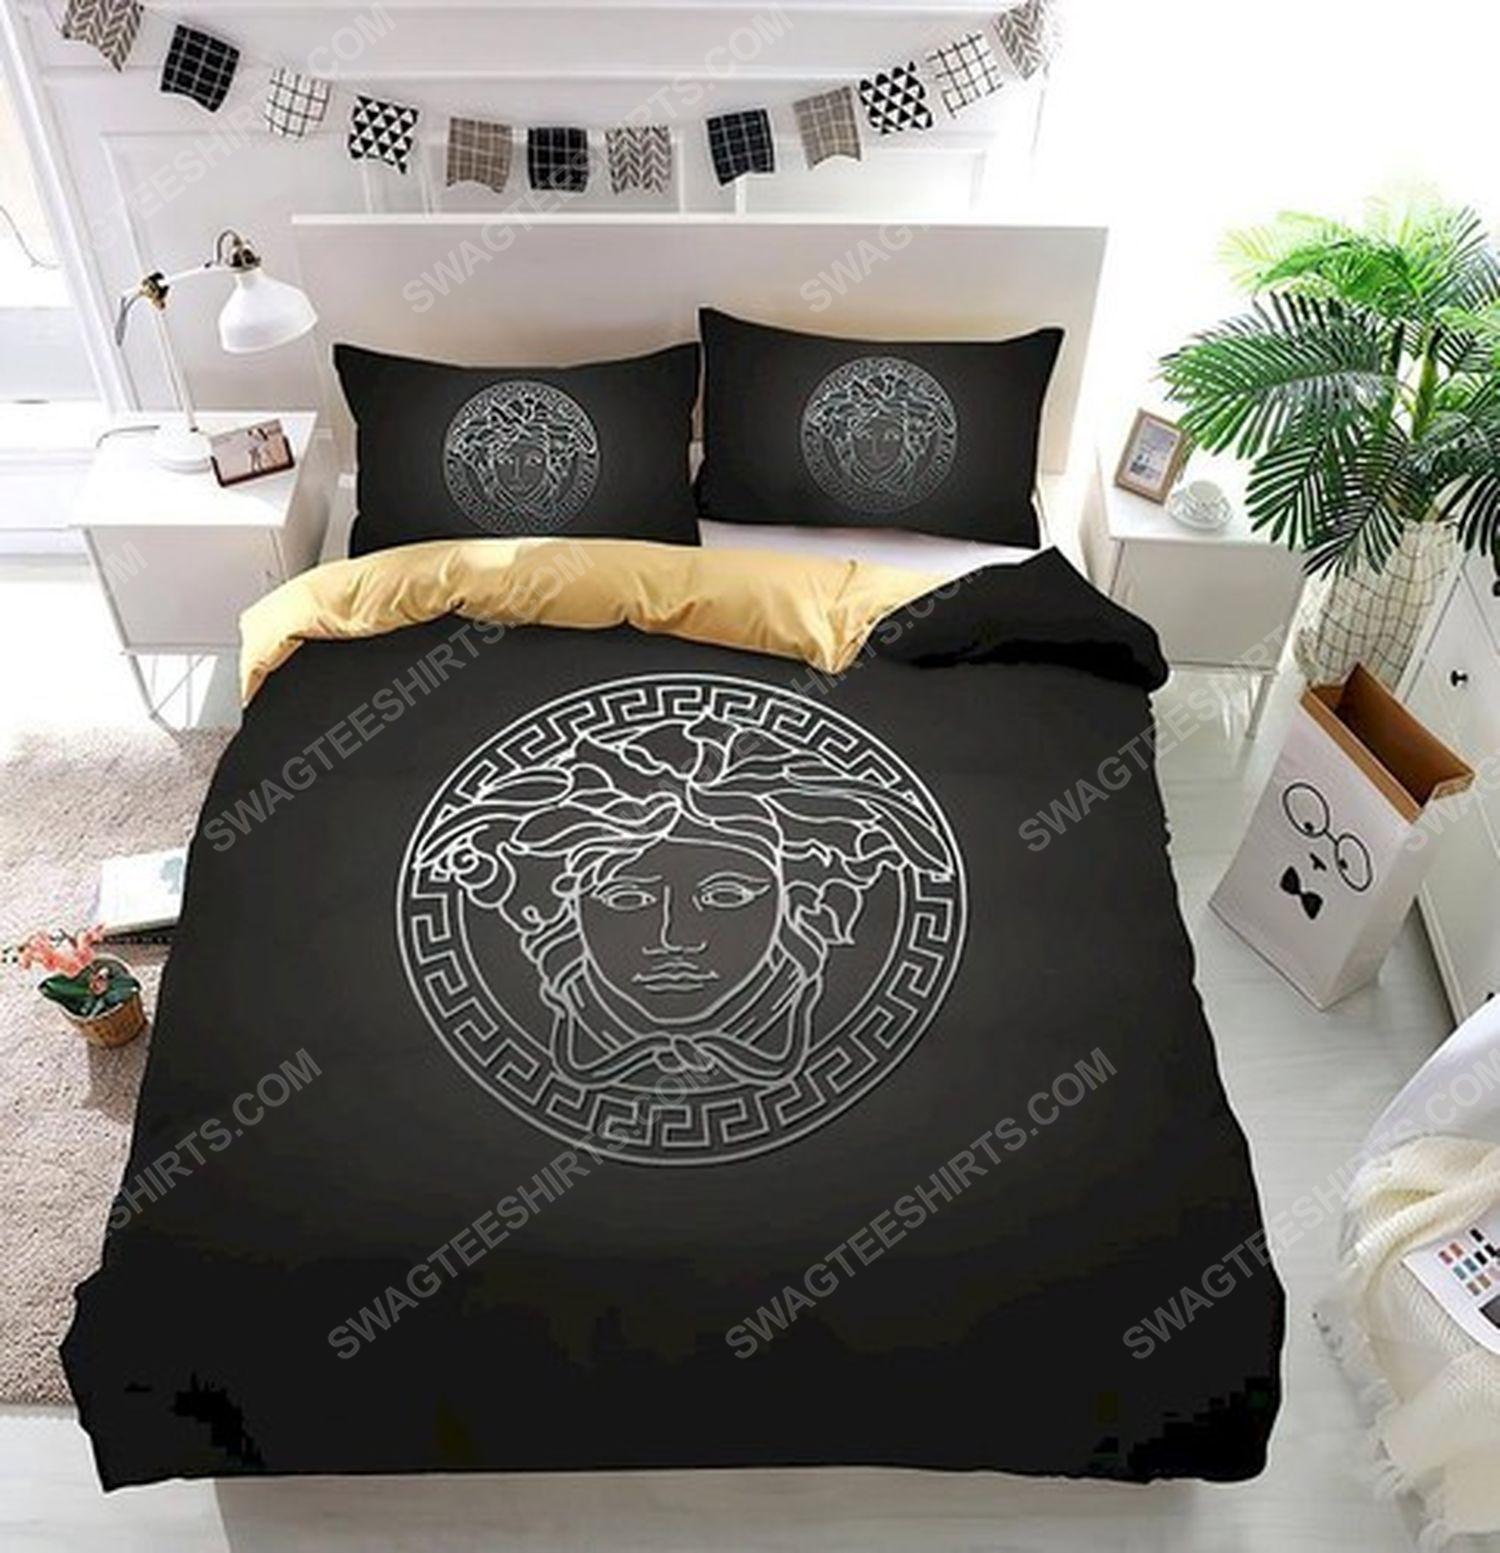 Versace home black version full print duvet cover bedding set 2 - Copy